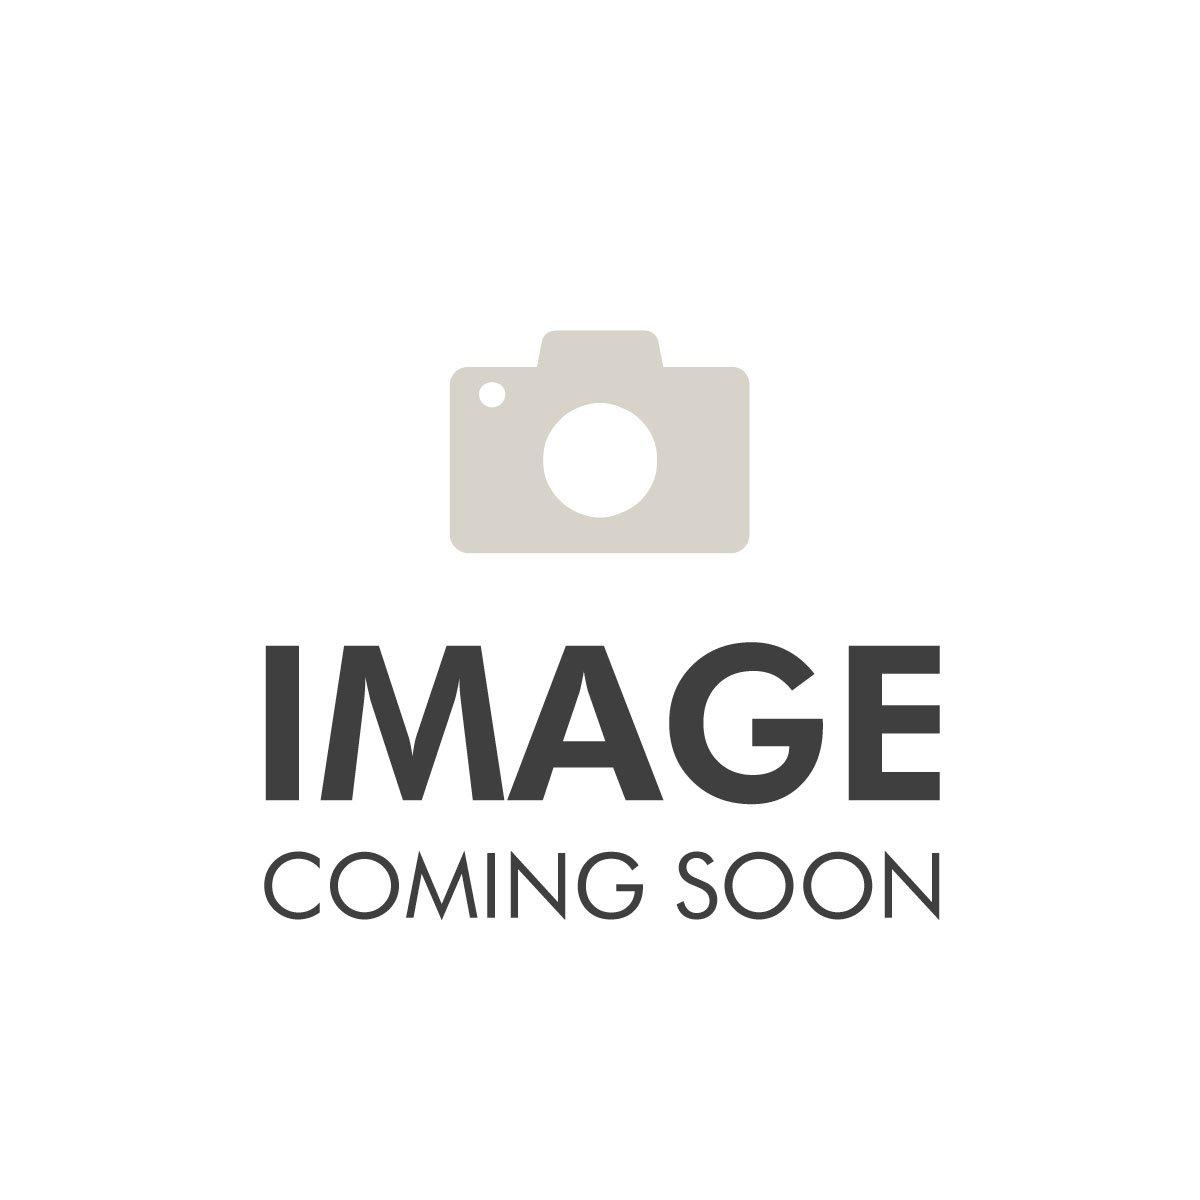 Kerastase Elixir Ultime Shampooing À L'huile Sublimatrice 250ml